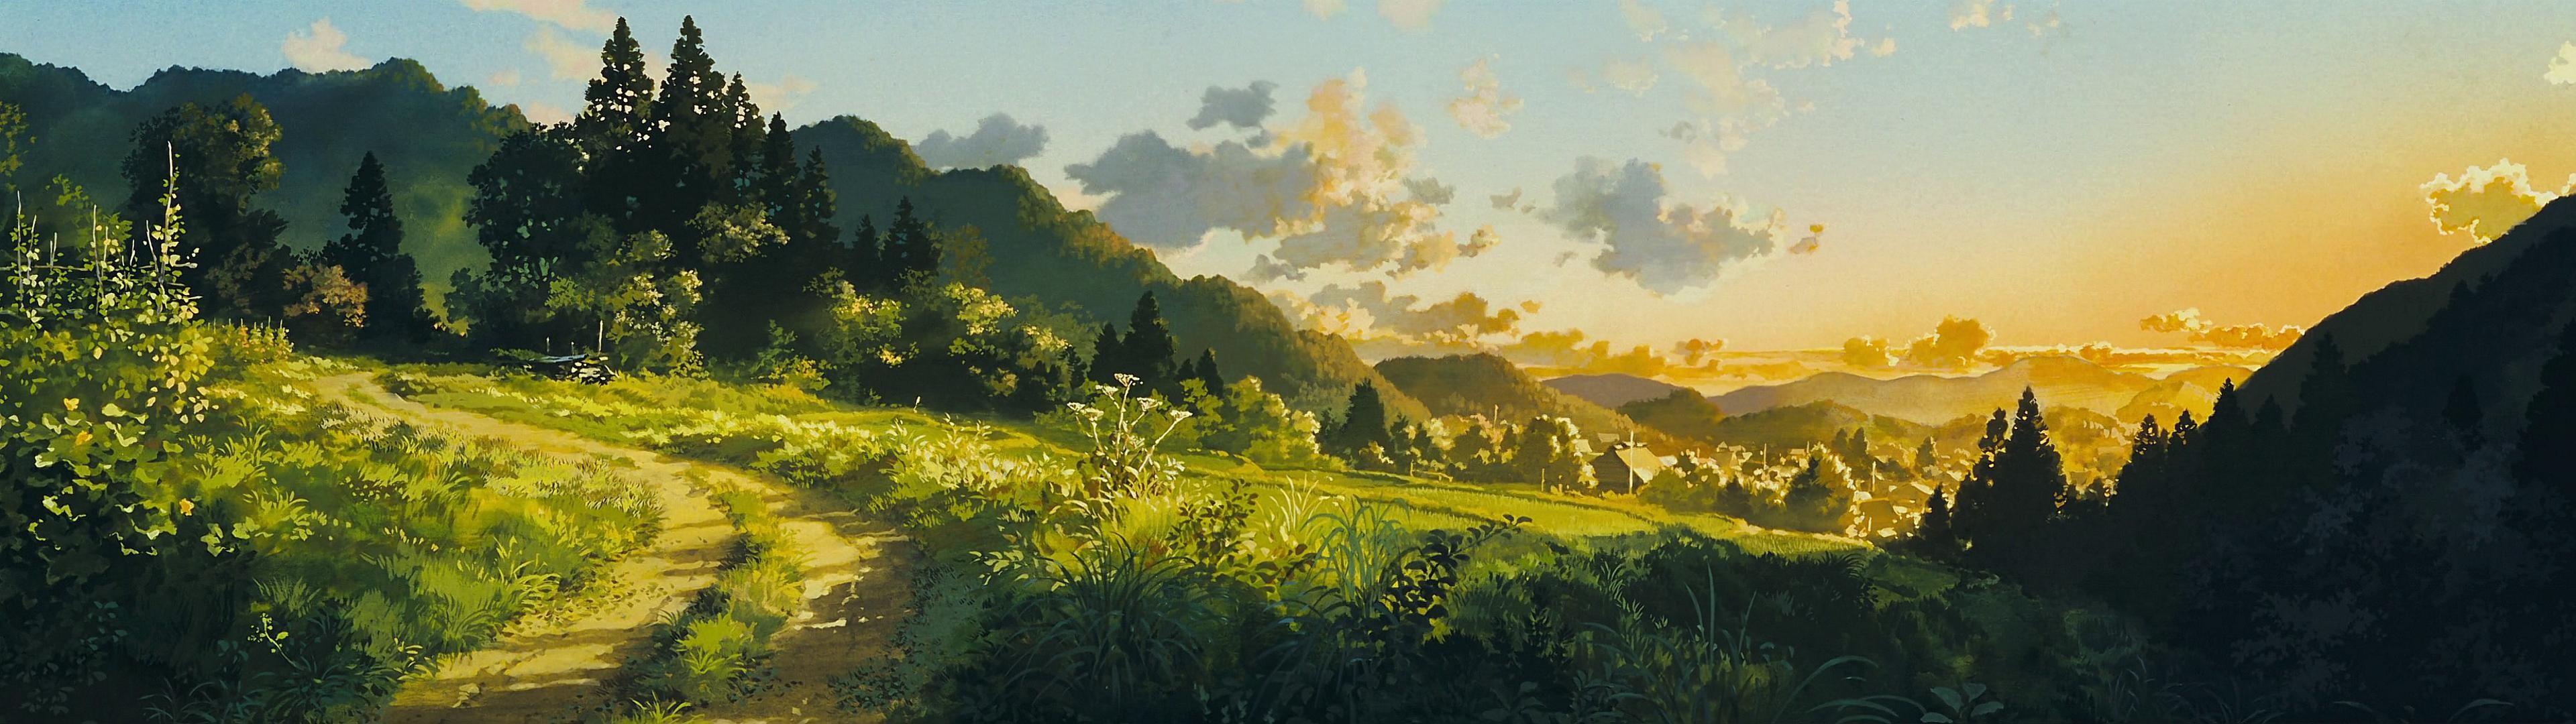 Ghibli 3840 x 1080 Studio ghibli, Wallpaper and Studio